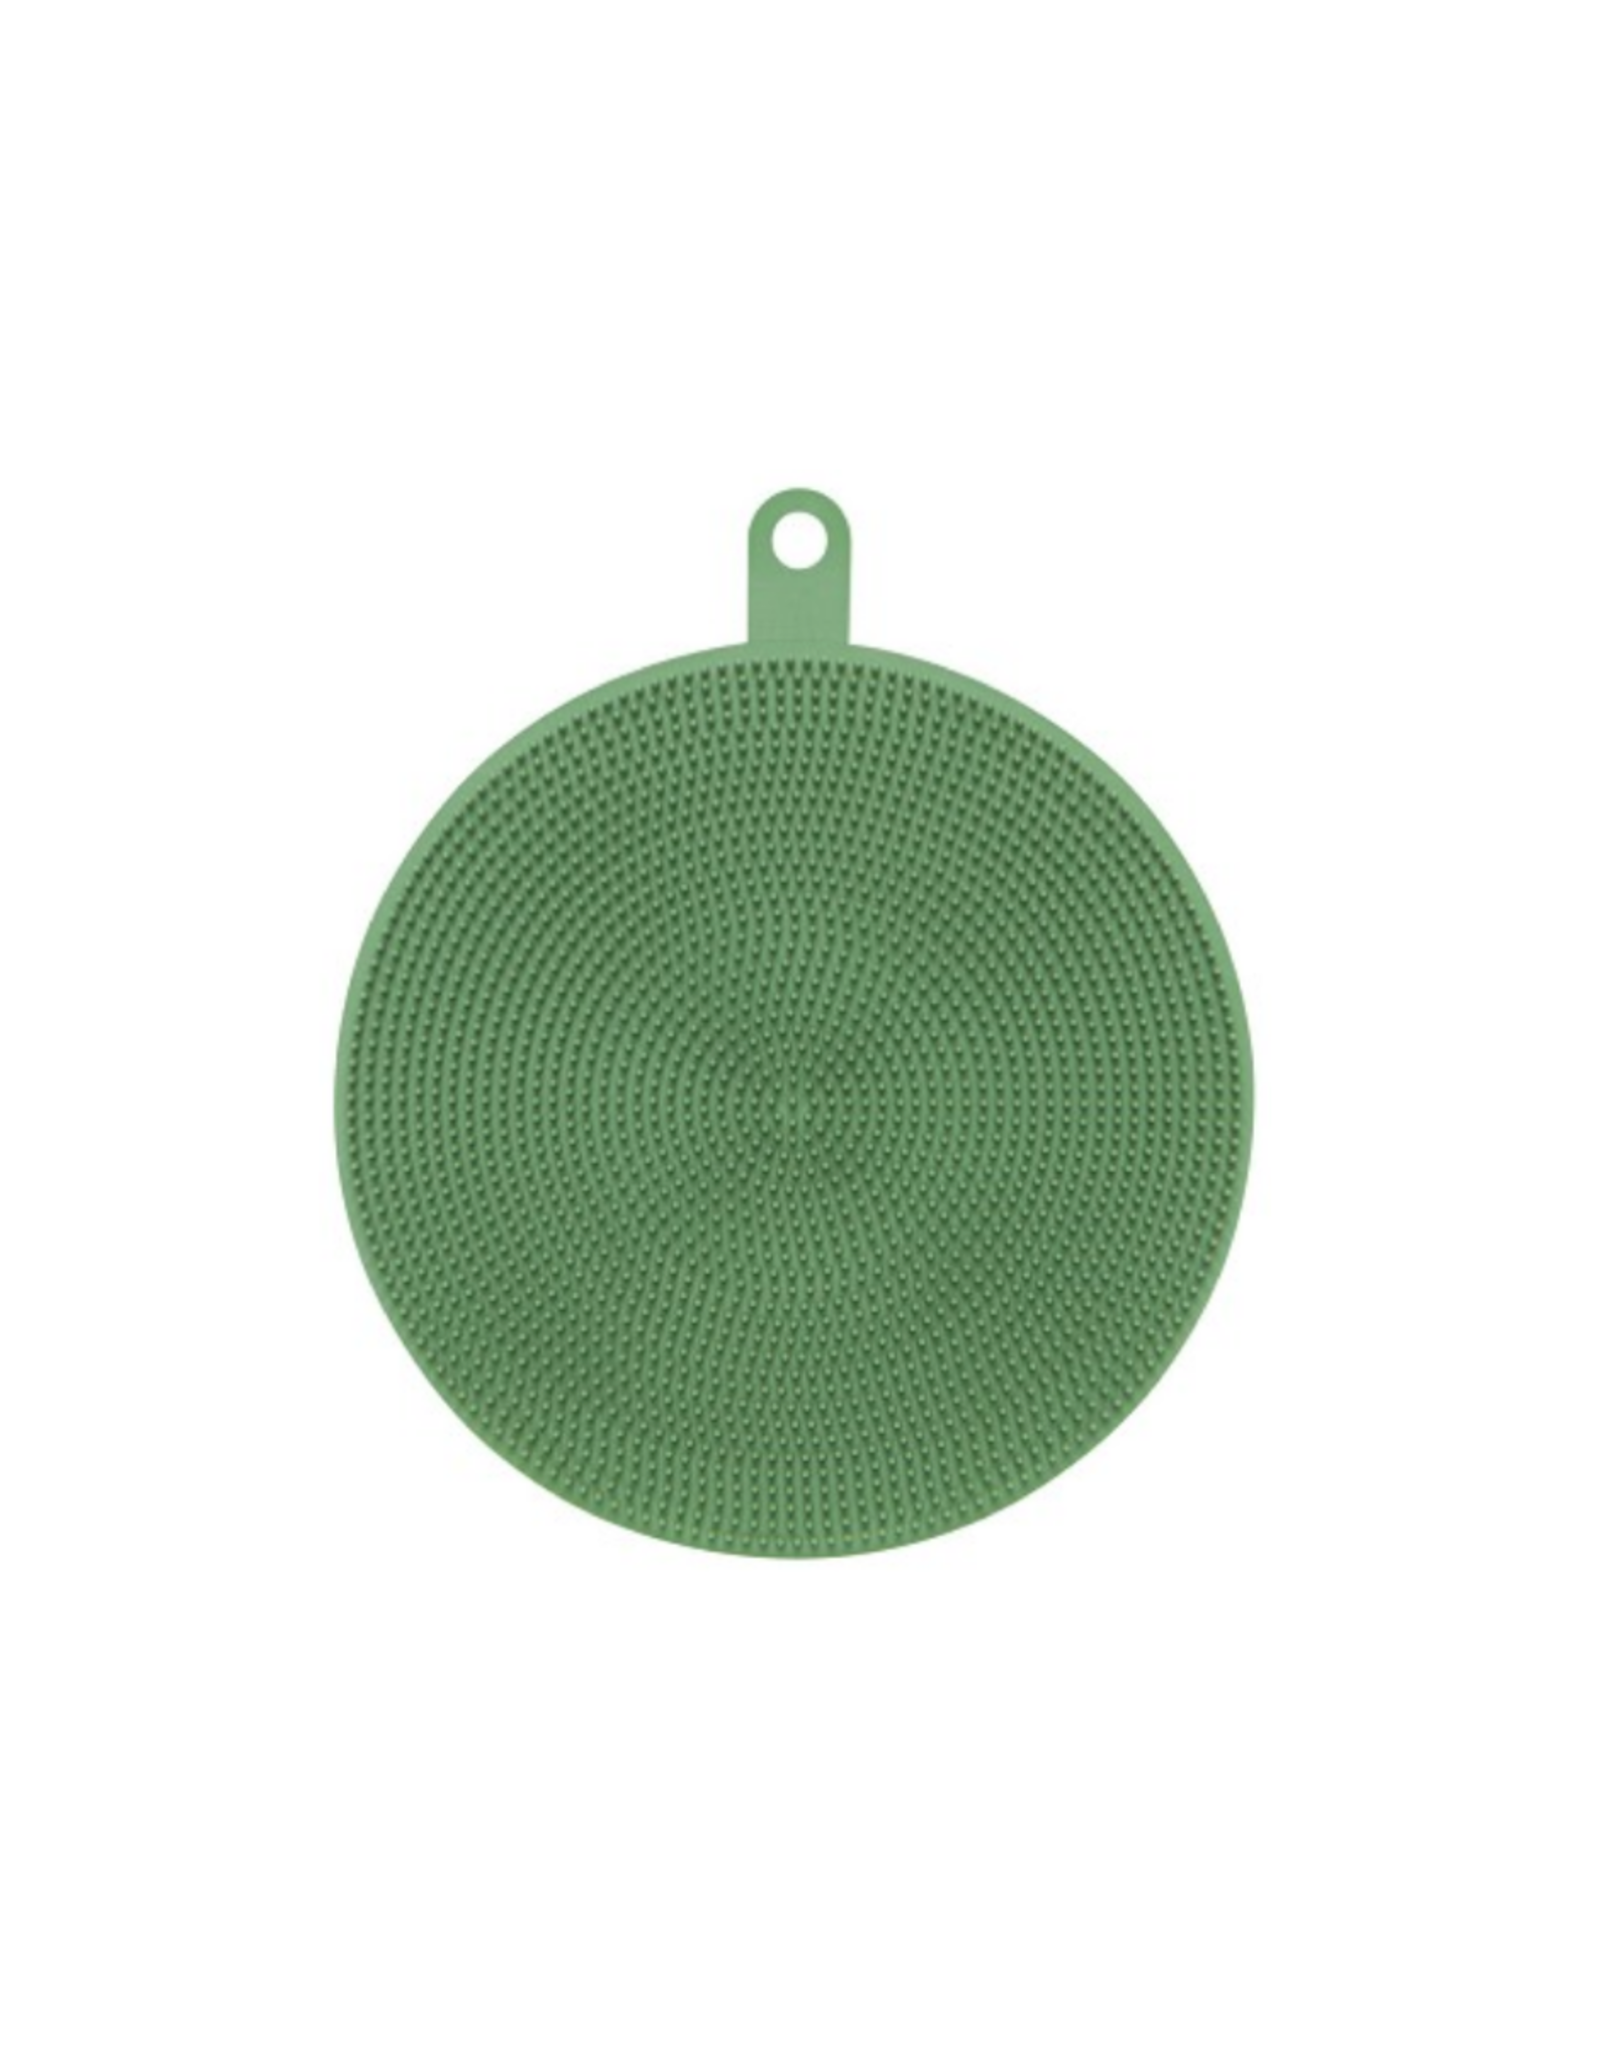 DCA - Silicone Scrub or Soap Rest/Green